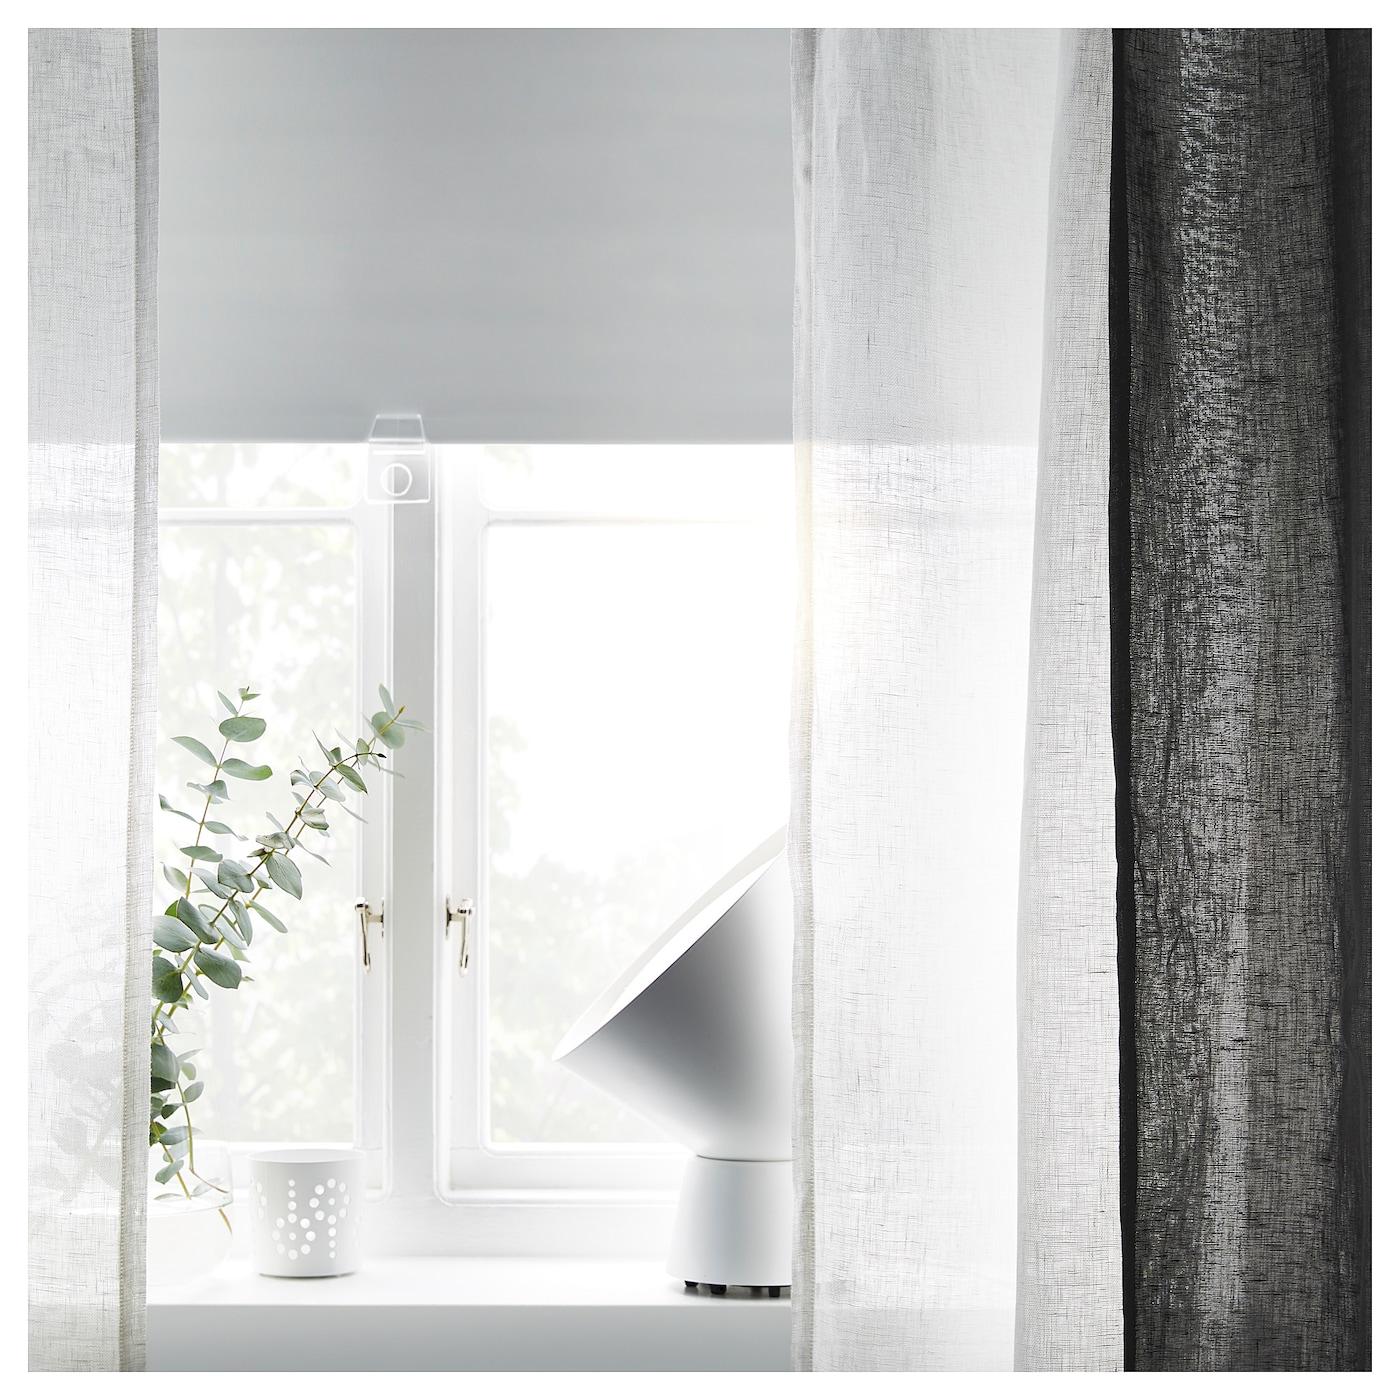 TUPPLUR 图普勒 遮光卷帘, 白色, 140x195 厘米